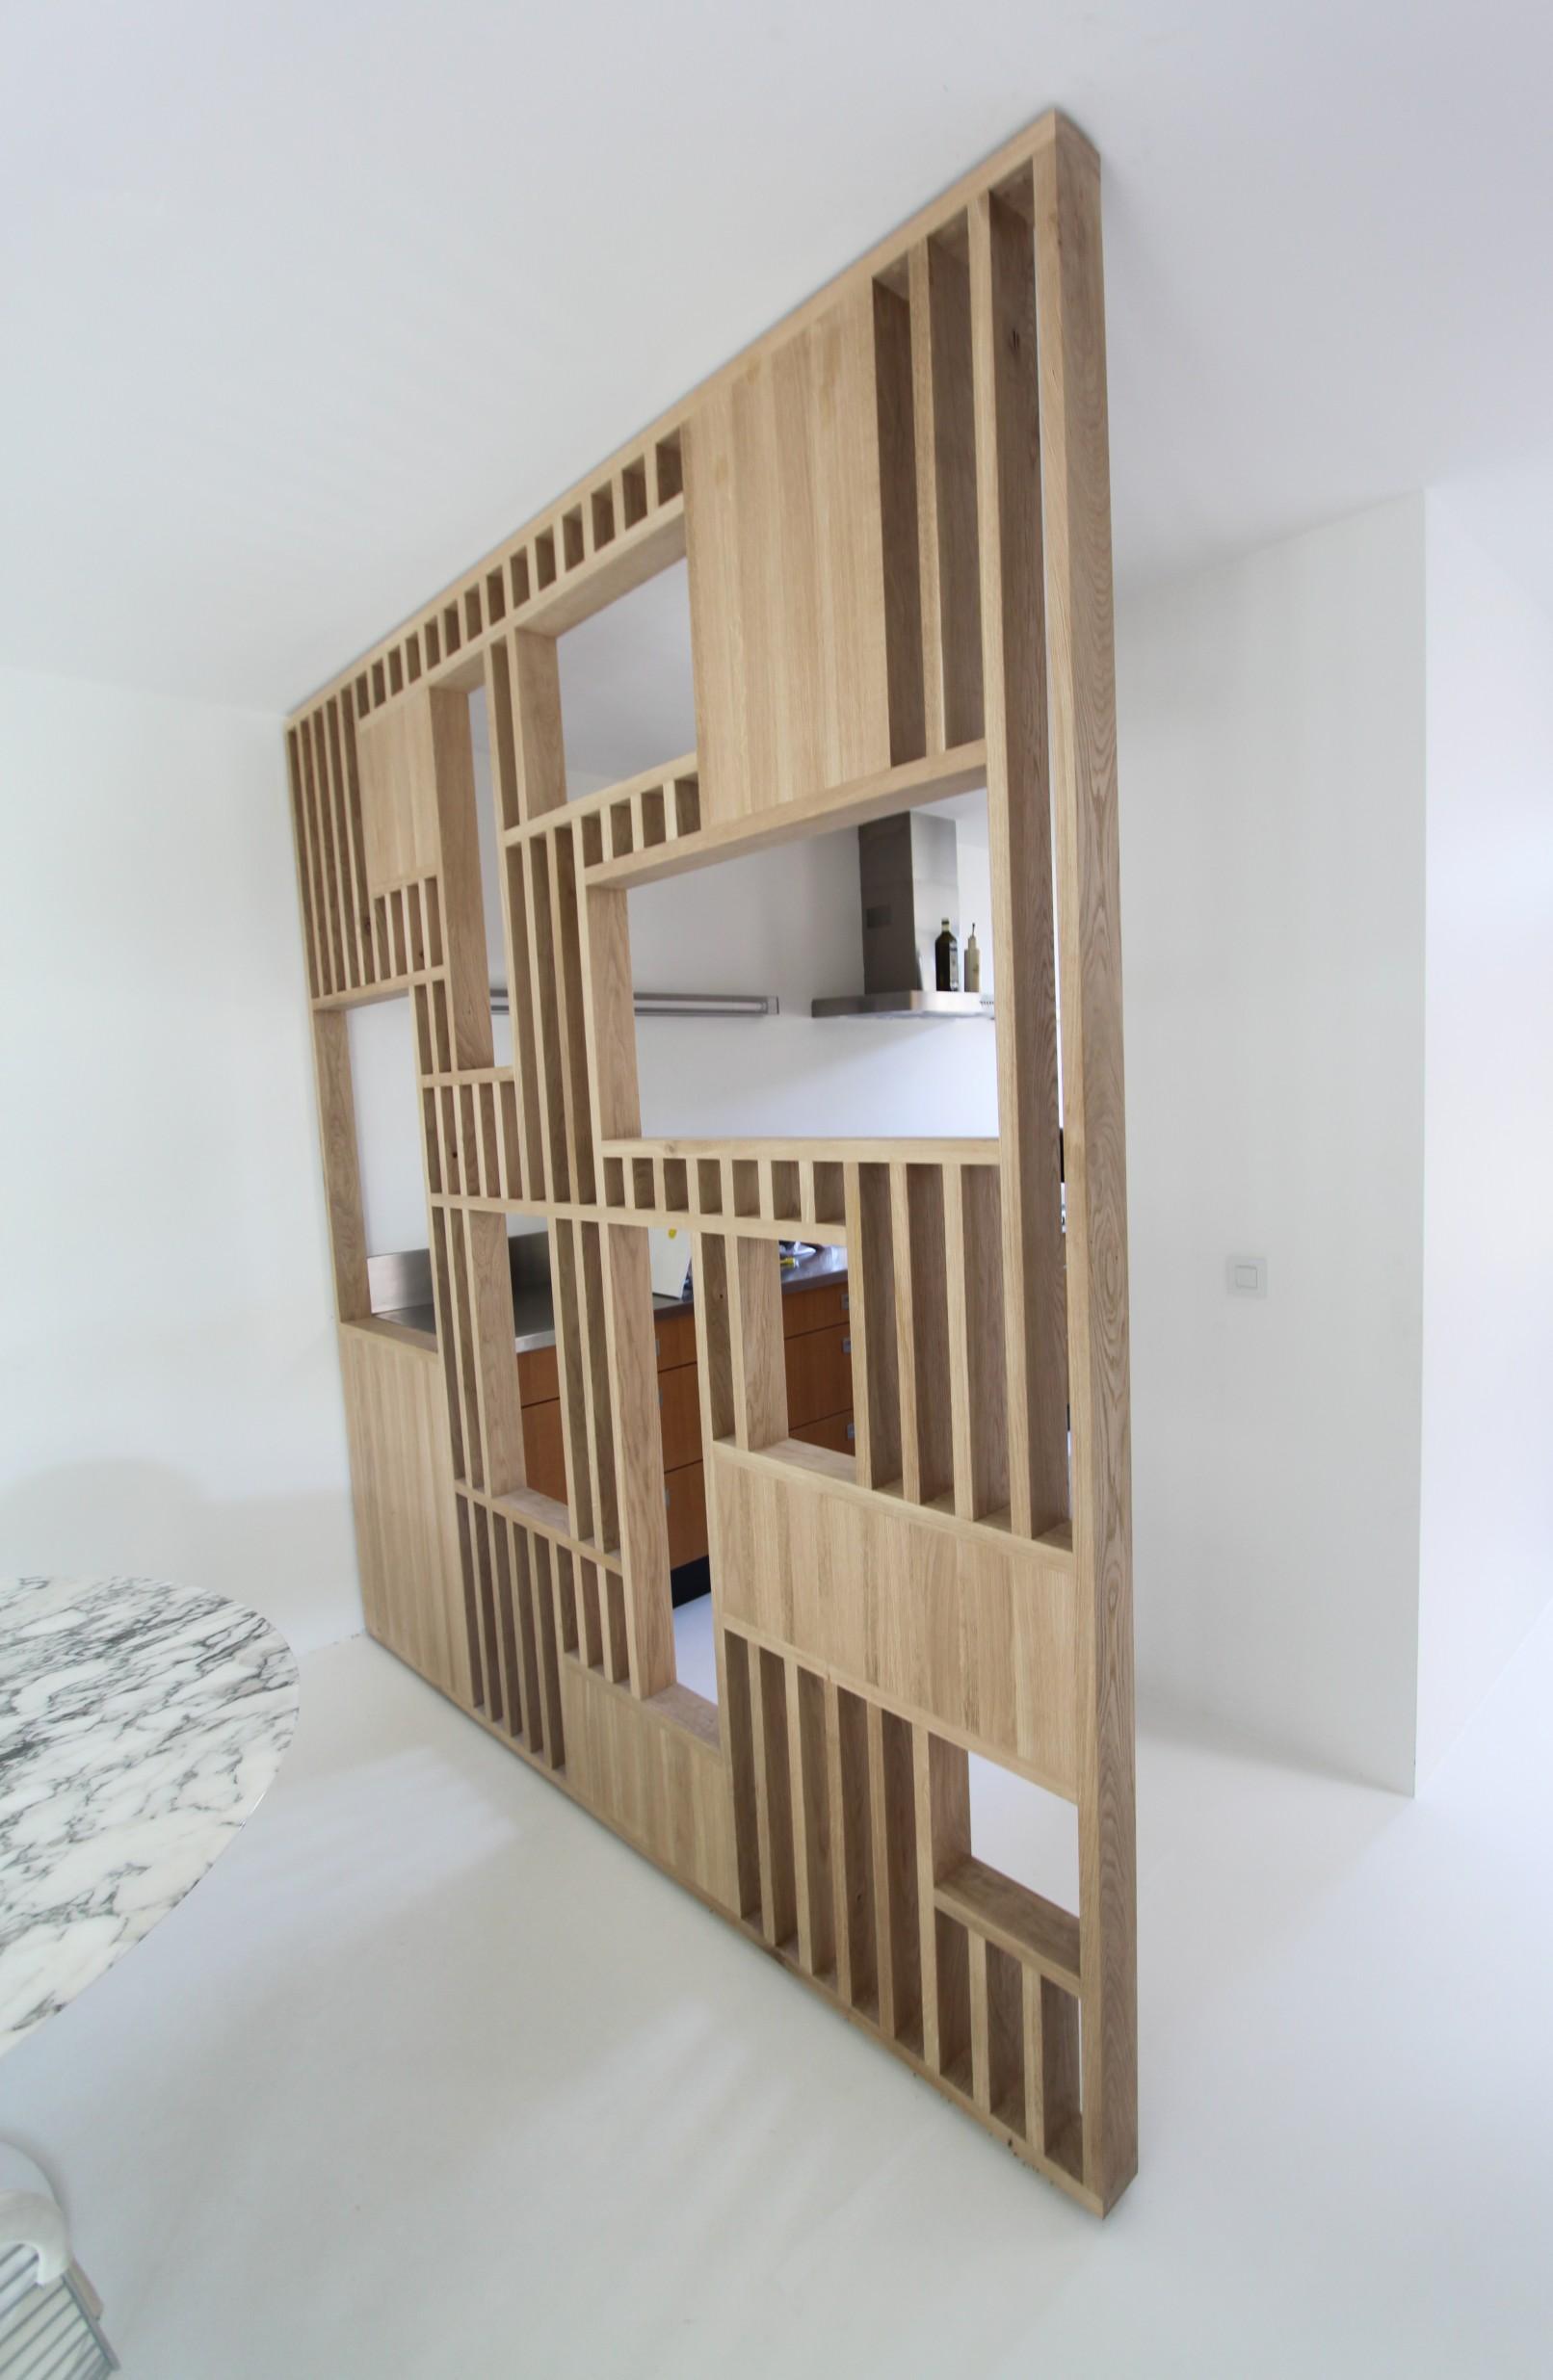 Op maat gemaakte roomdivider tussen keuken en woonkamer